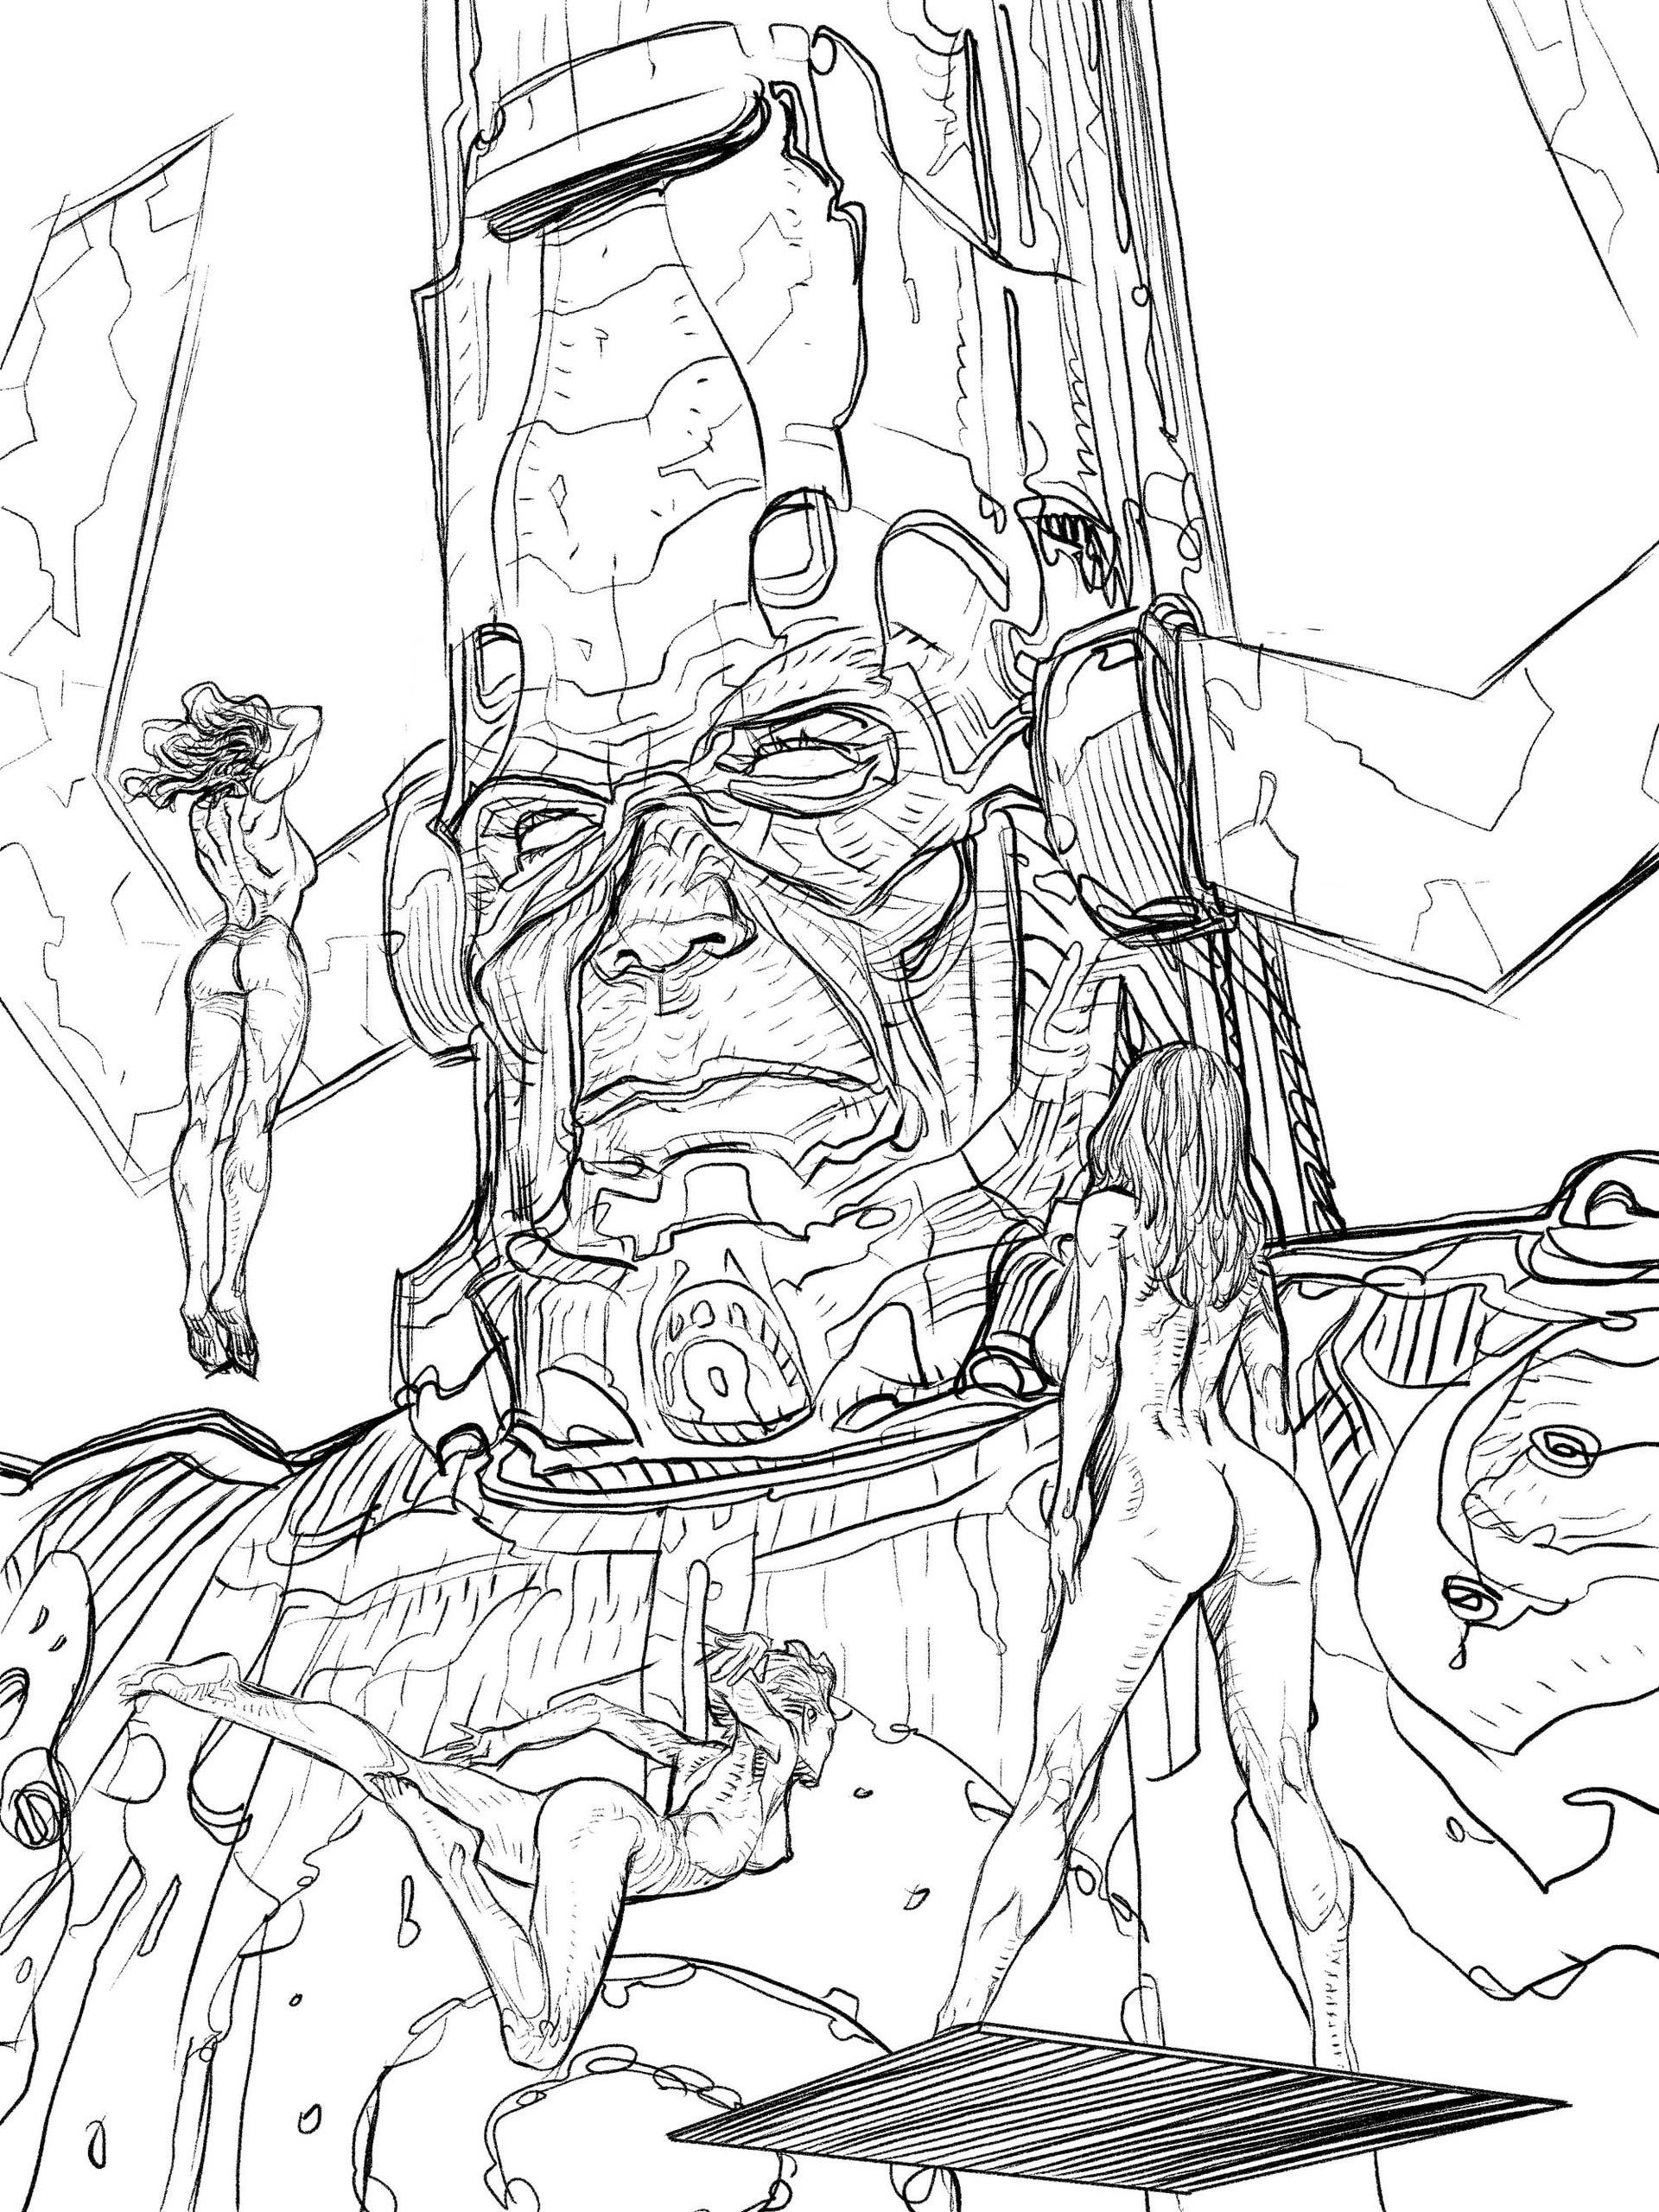 Daniele afferni daniele afferni artist galactus ink